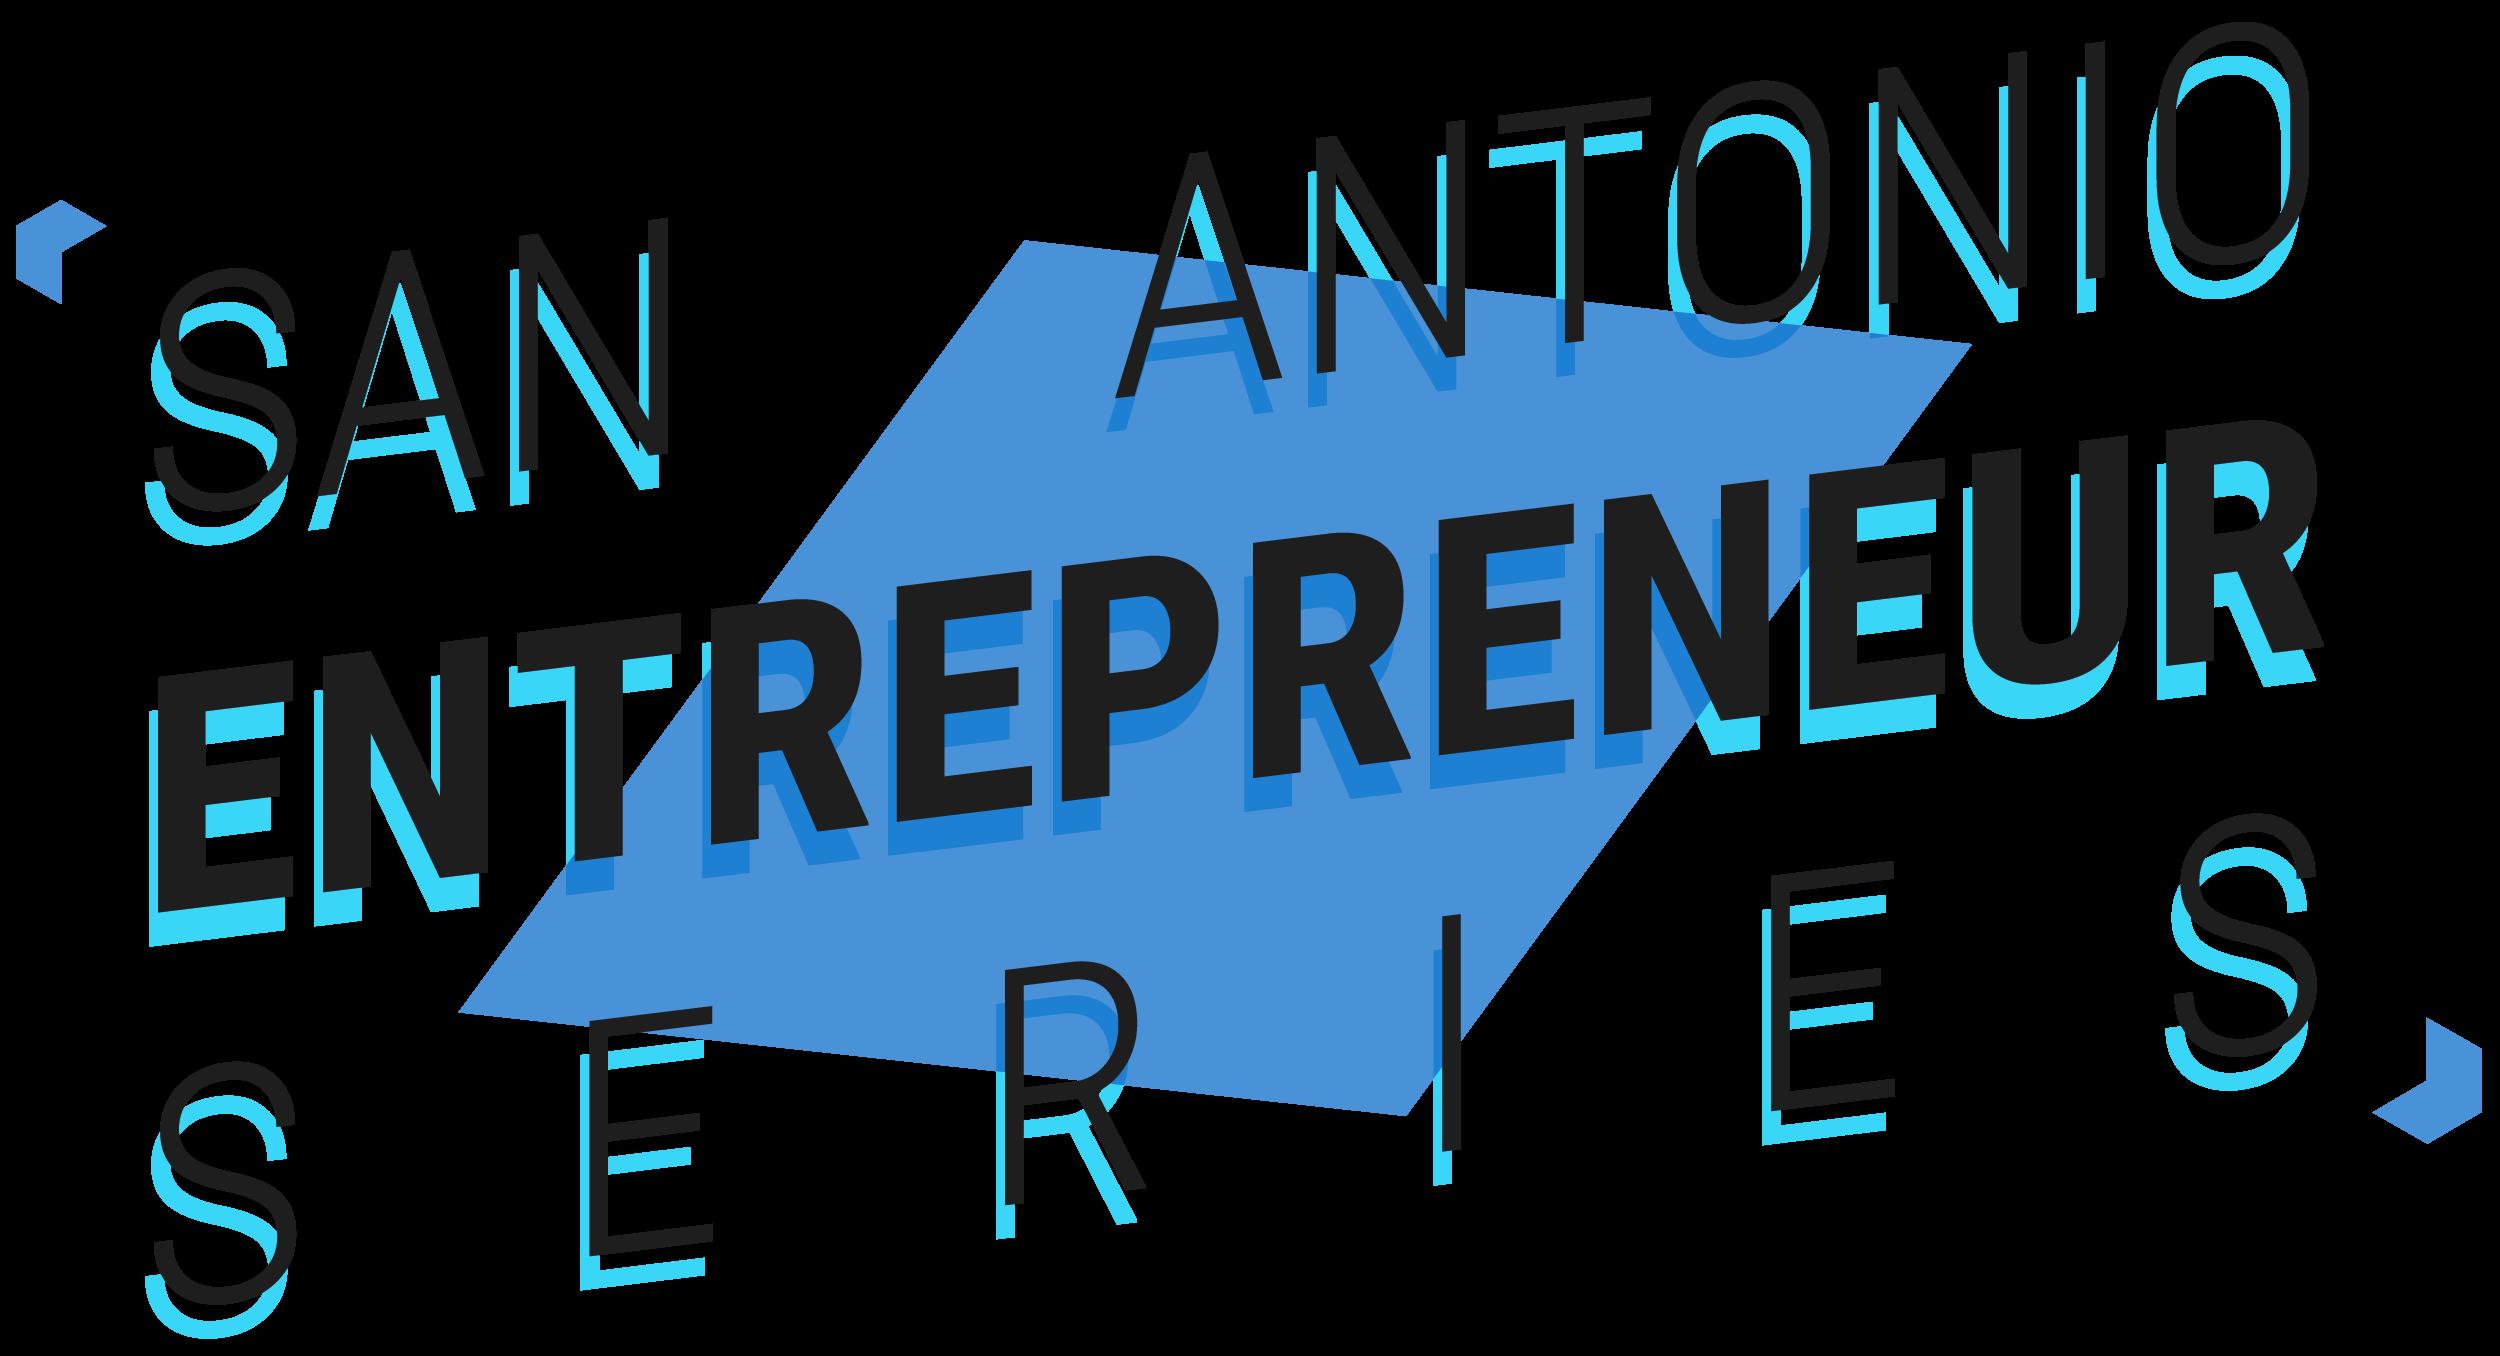 SanAntonioEntrepreneurSeries.png